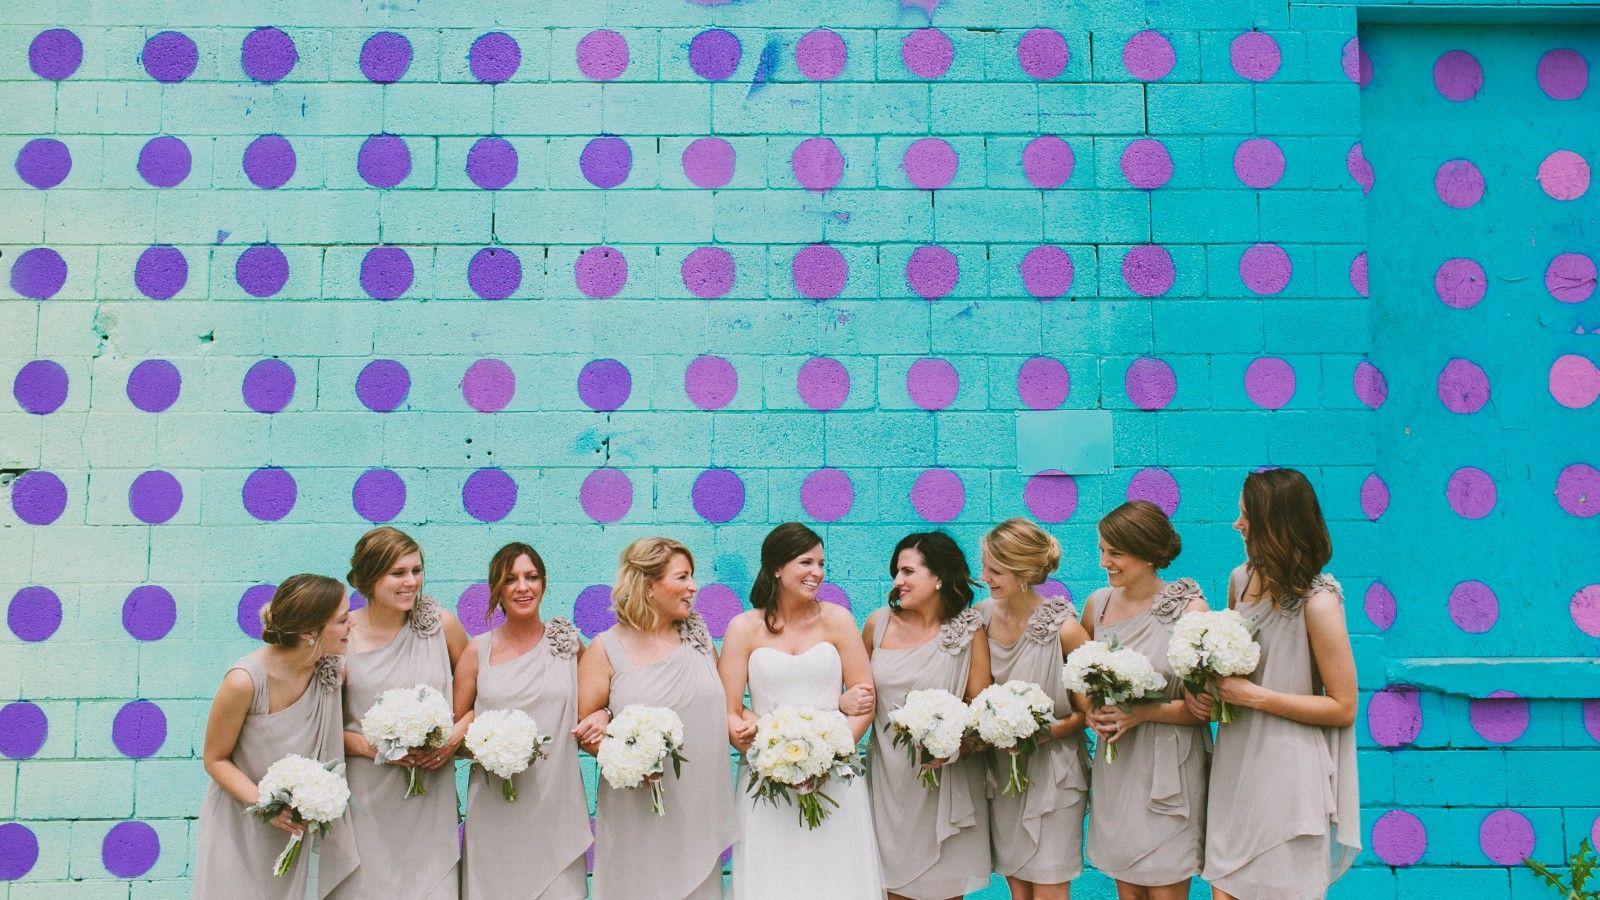 Blue Vinyl Photography. Nashville based, husband and wife team  www.bluevinylphotography.com